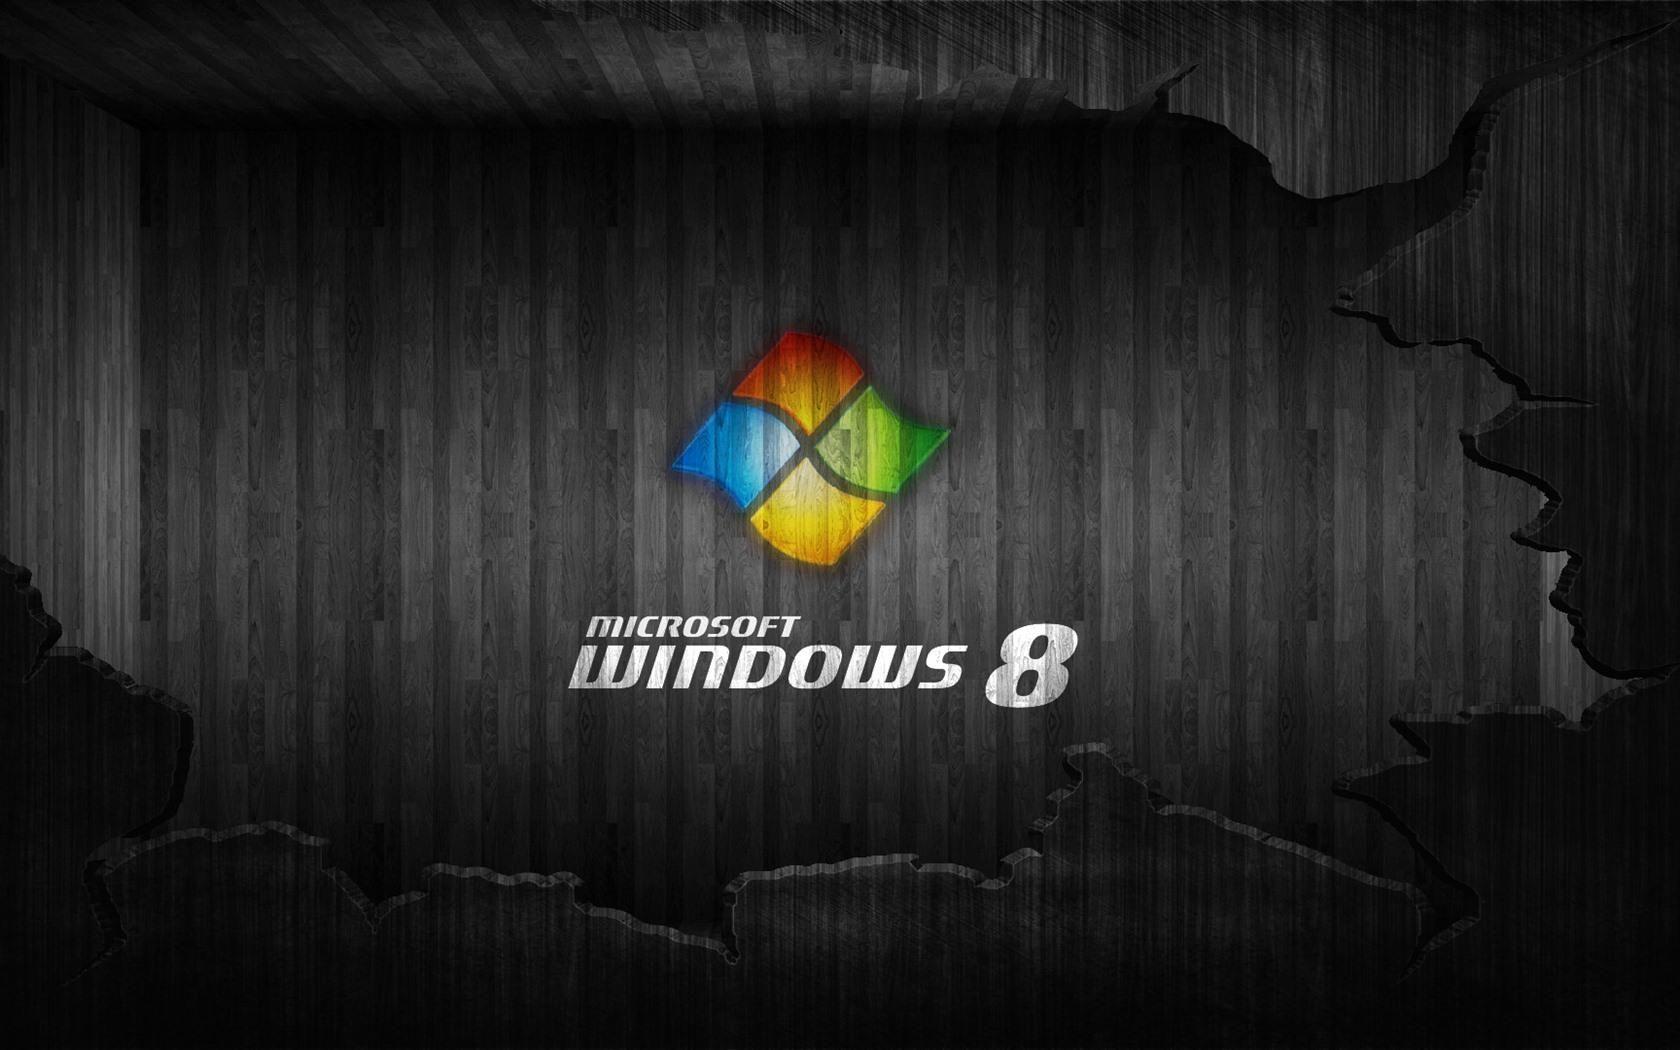 windows8 - wallpapers free - fonds d'écran gratuits by unesourisetmoi en 2019 | Fond ecran, Fond ...